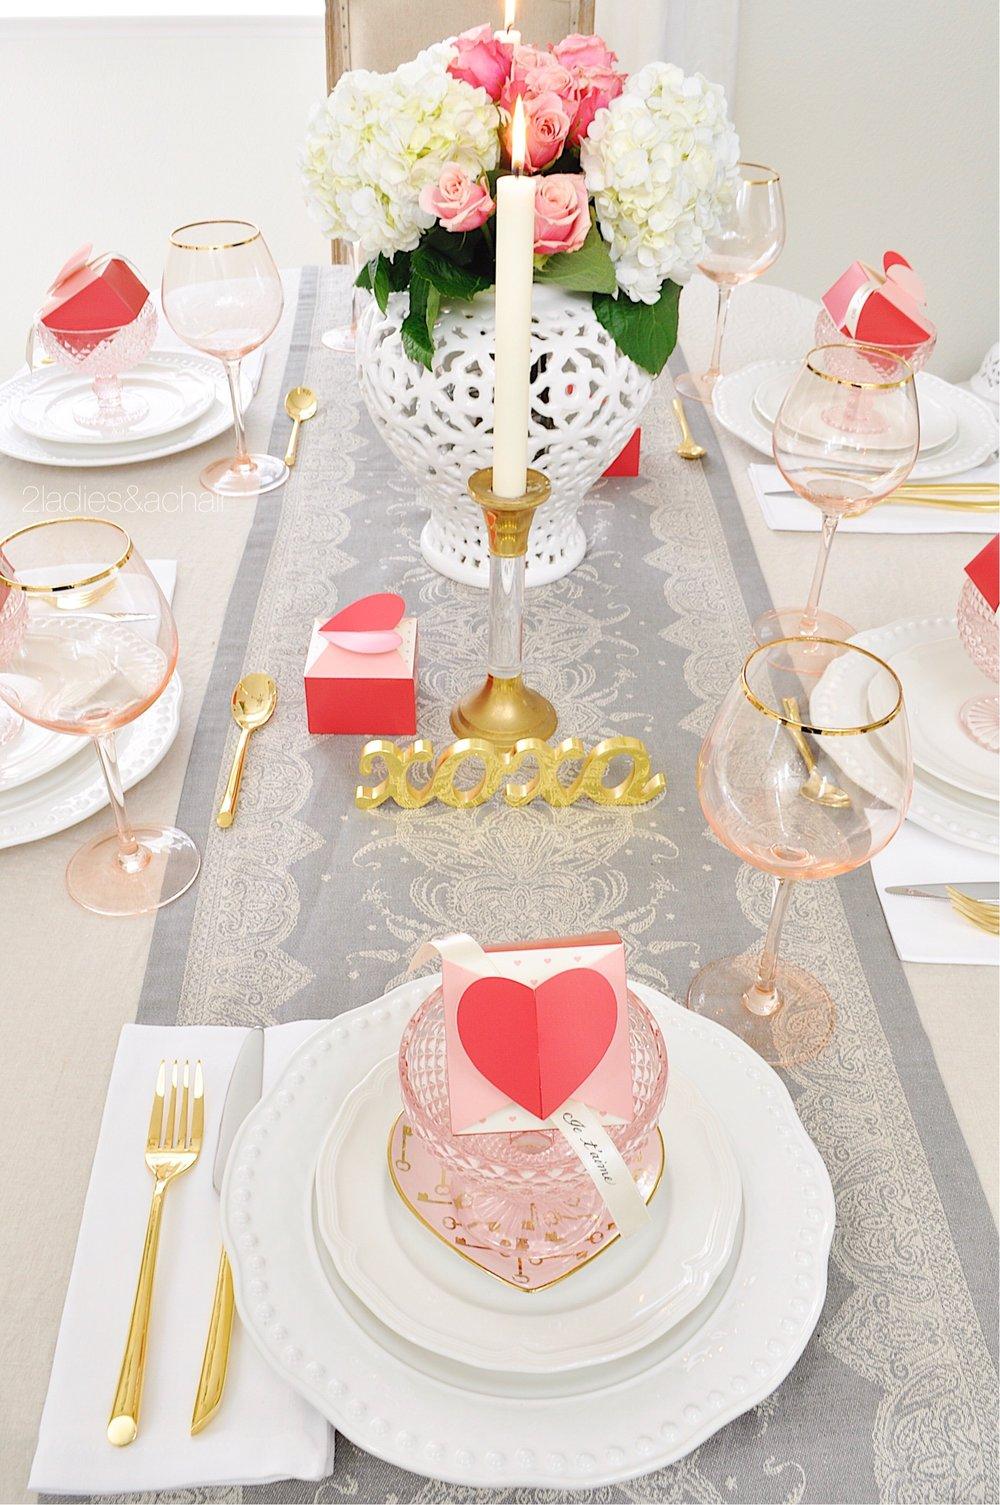 valentines day table decor IMG_0346.JPG